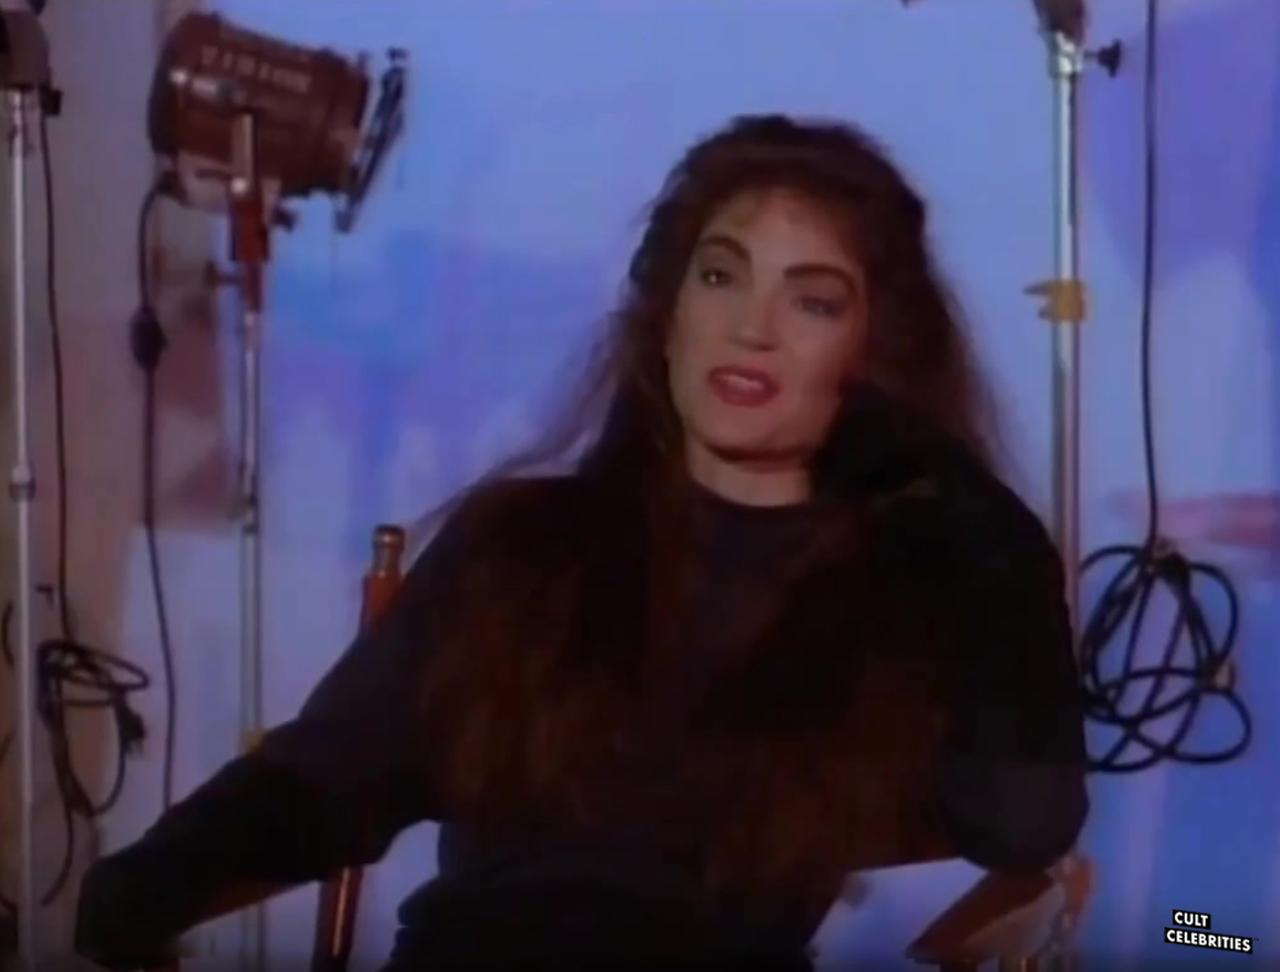 Brinke Stevens in Transylvania Twist (1989)